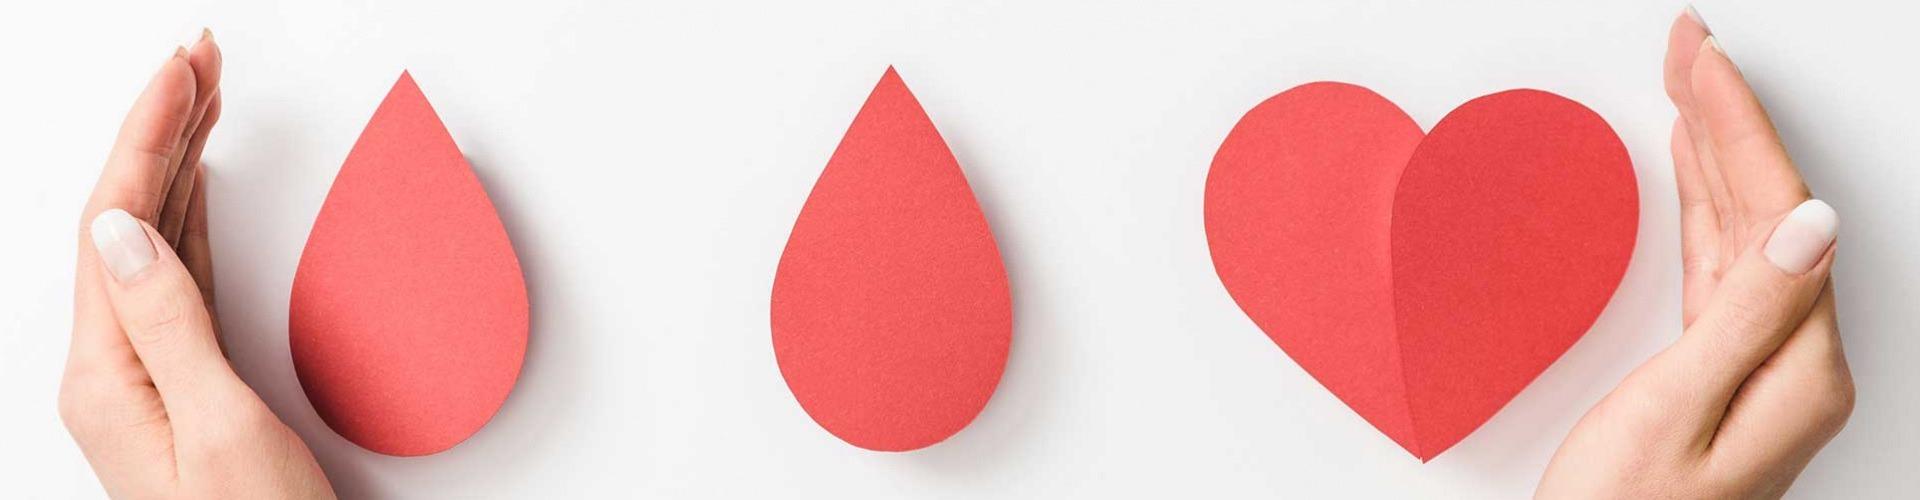 Vért adunk